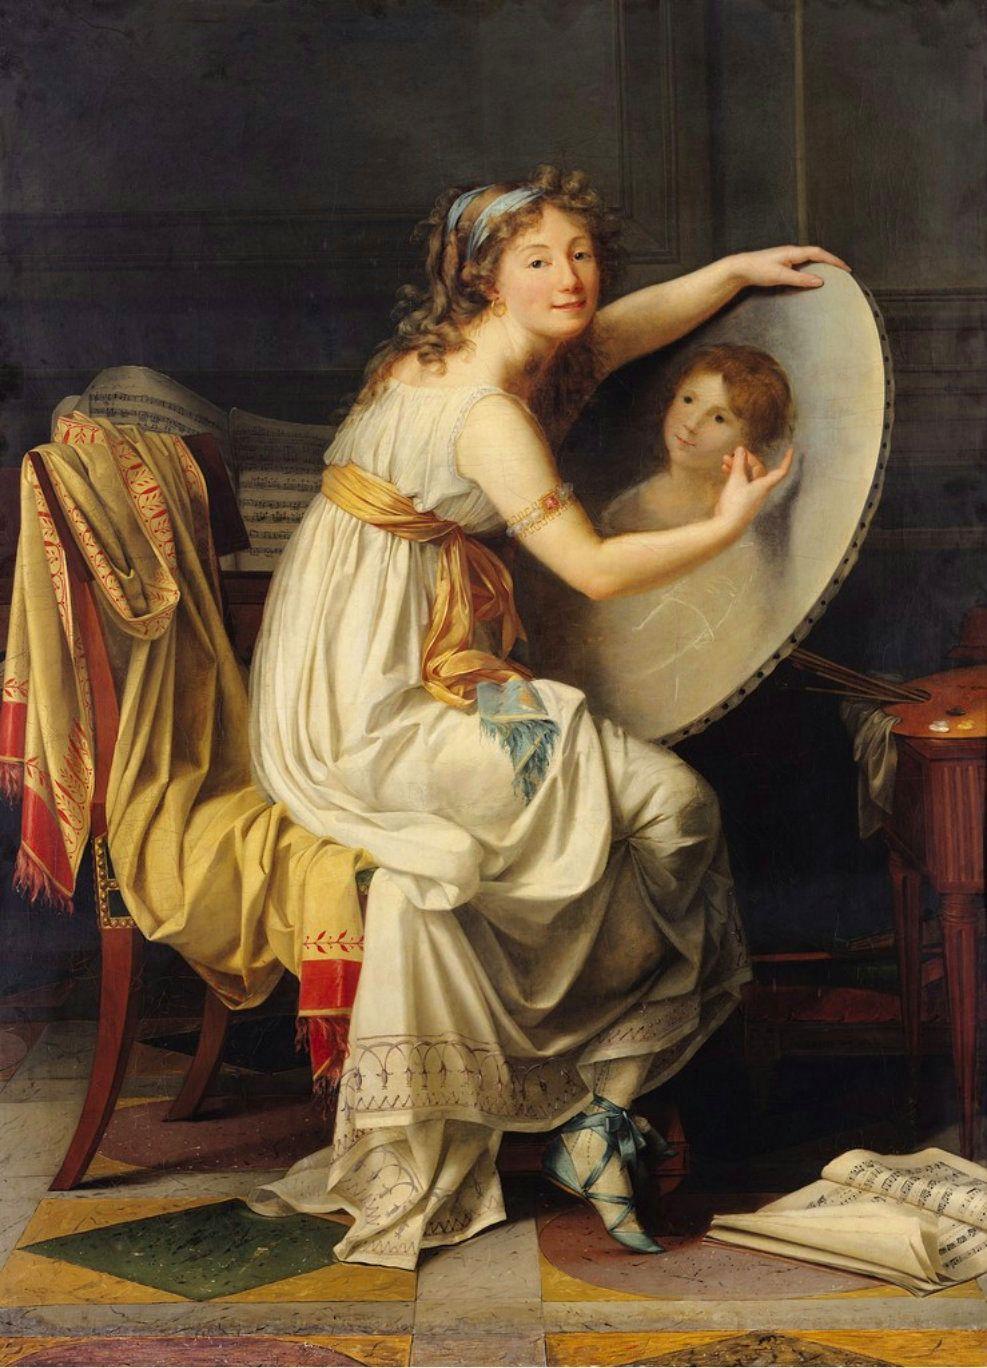 Rose Adelaide Ducreux